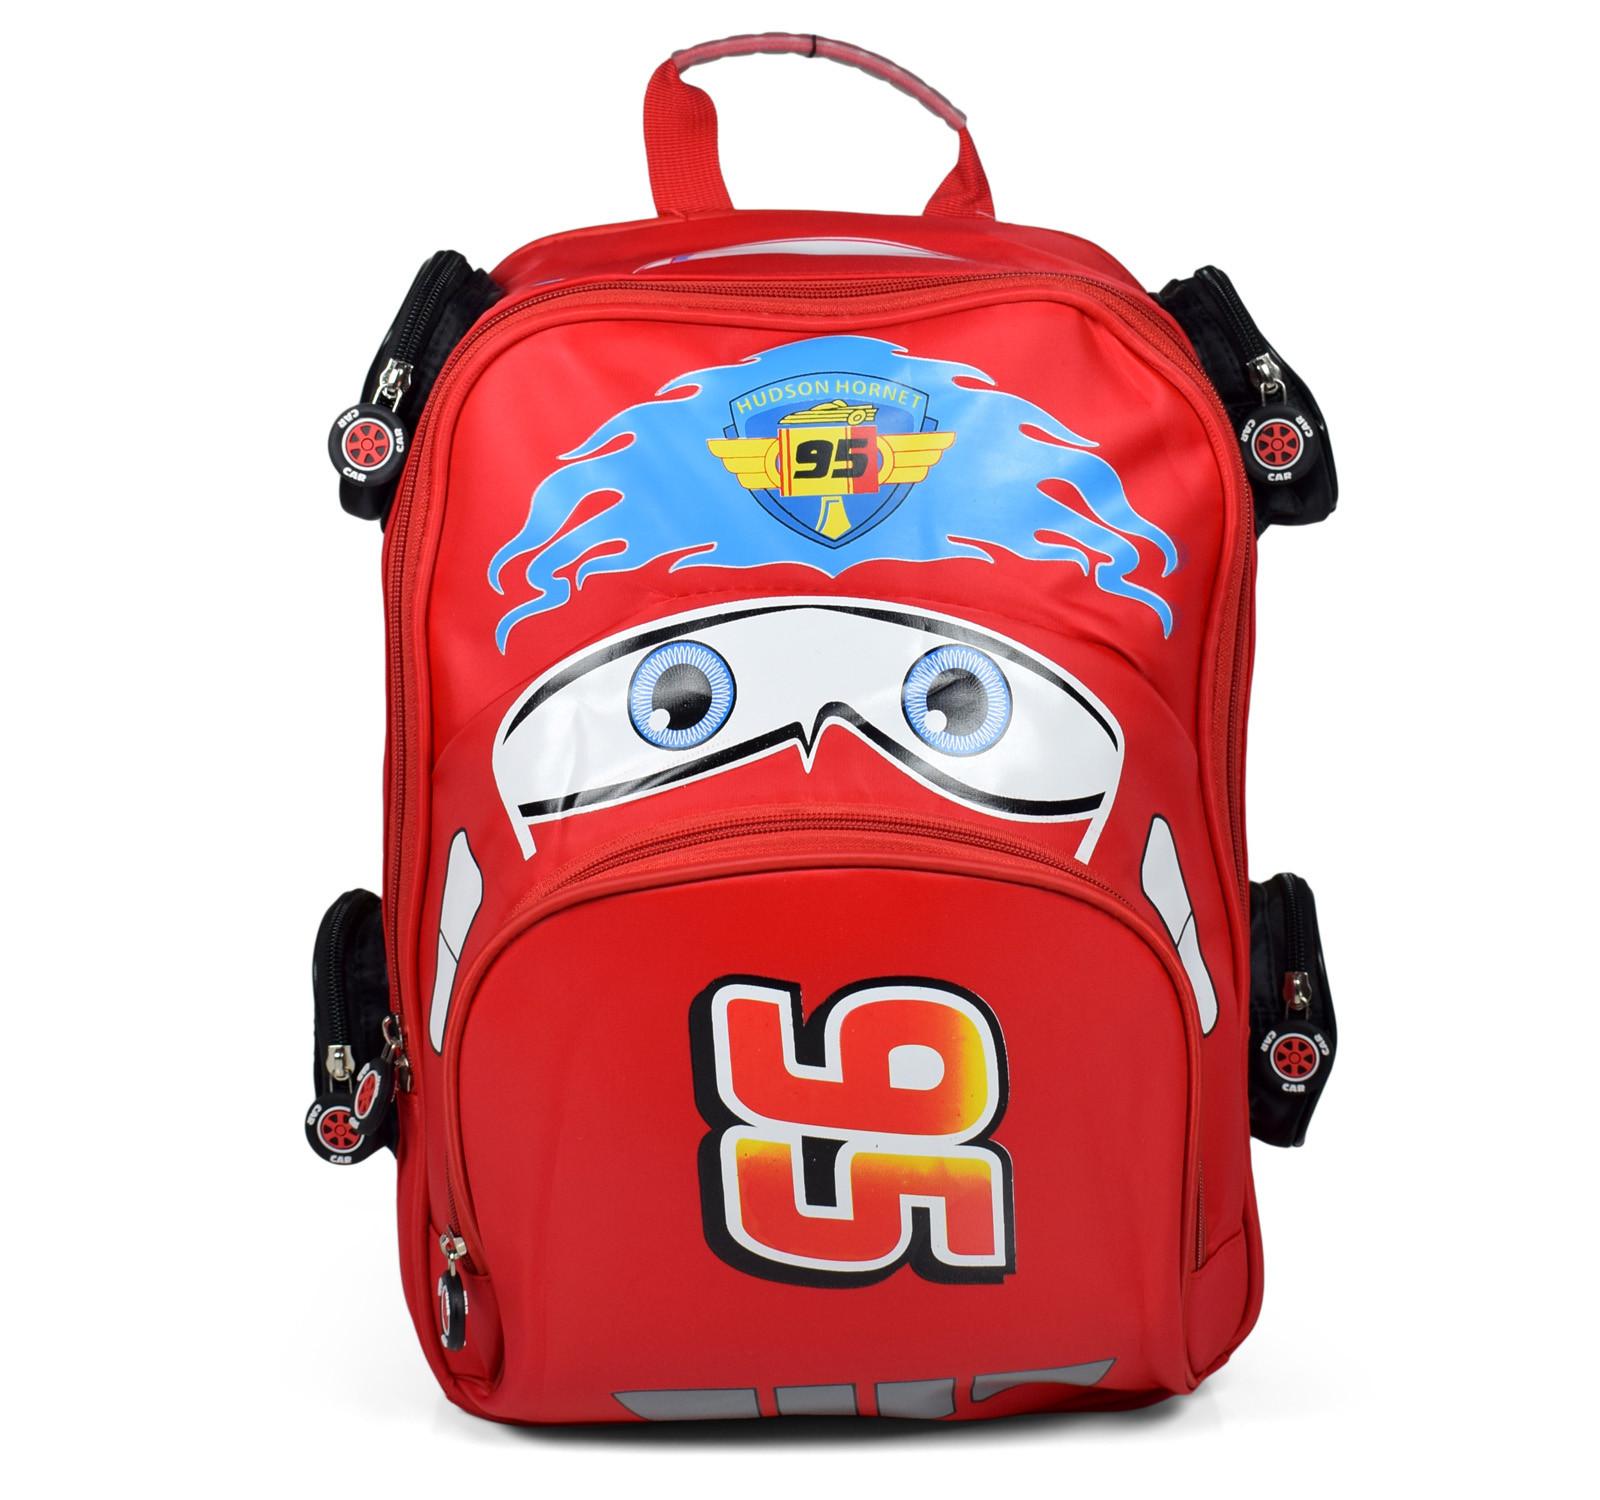 School bag photo